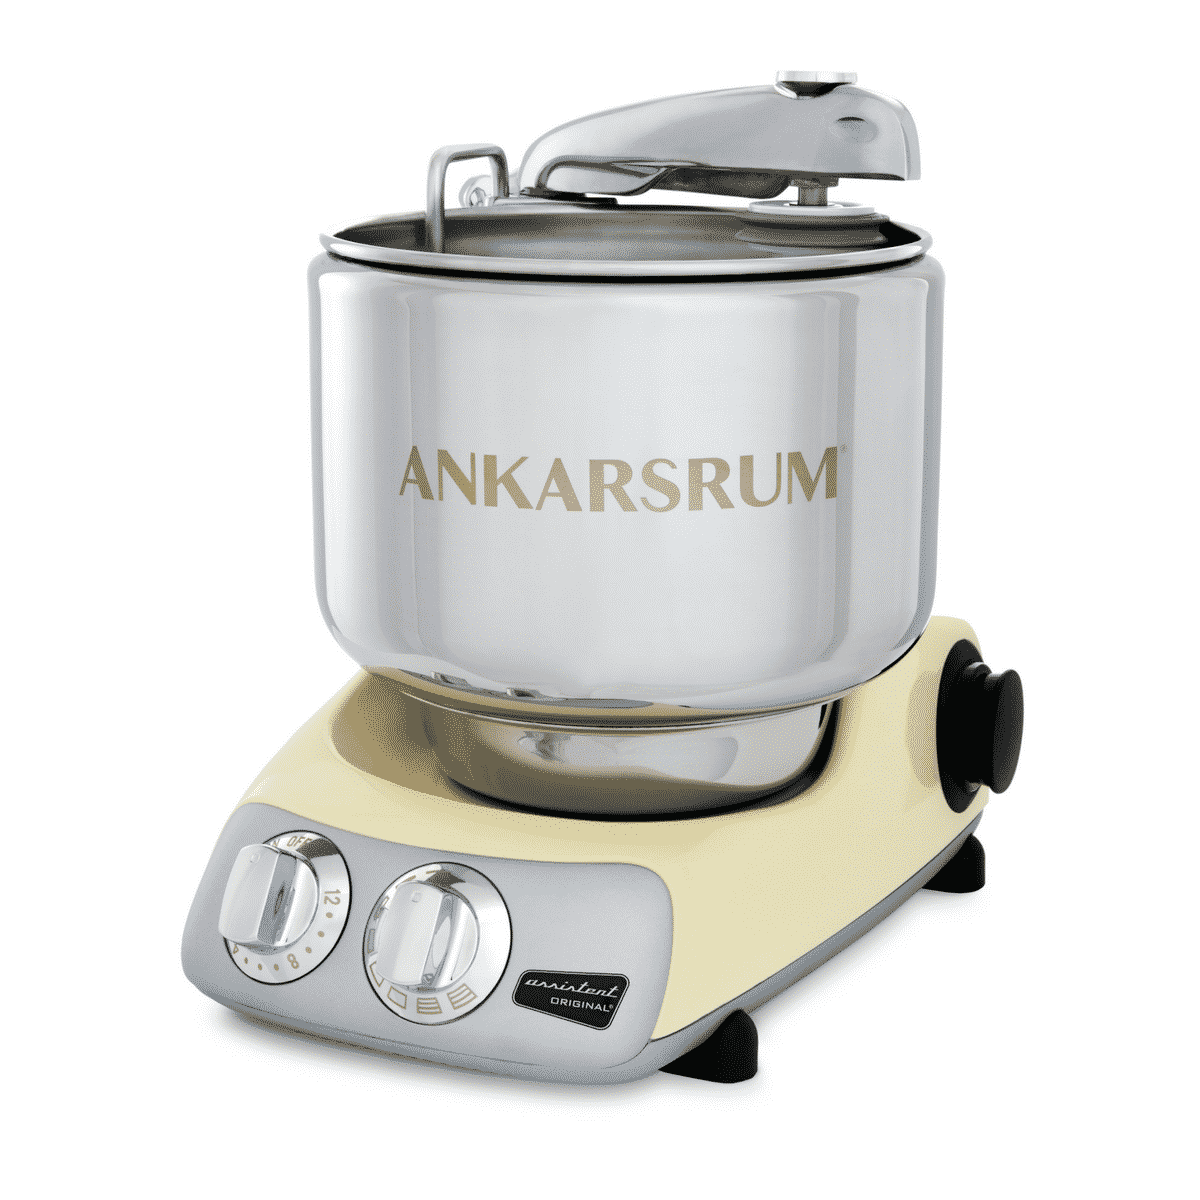 Ankarsrum Assistent Original AKM 6230 - Cremegul